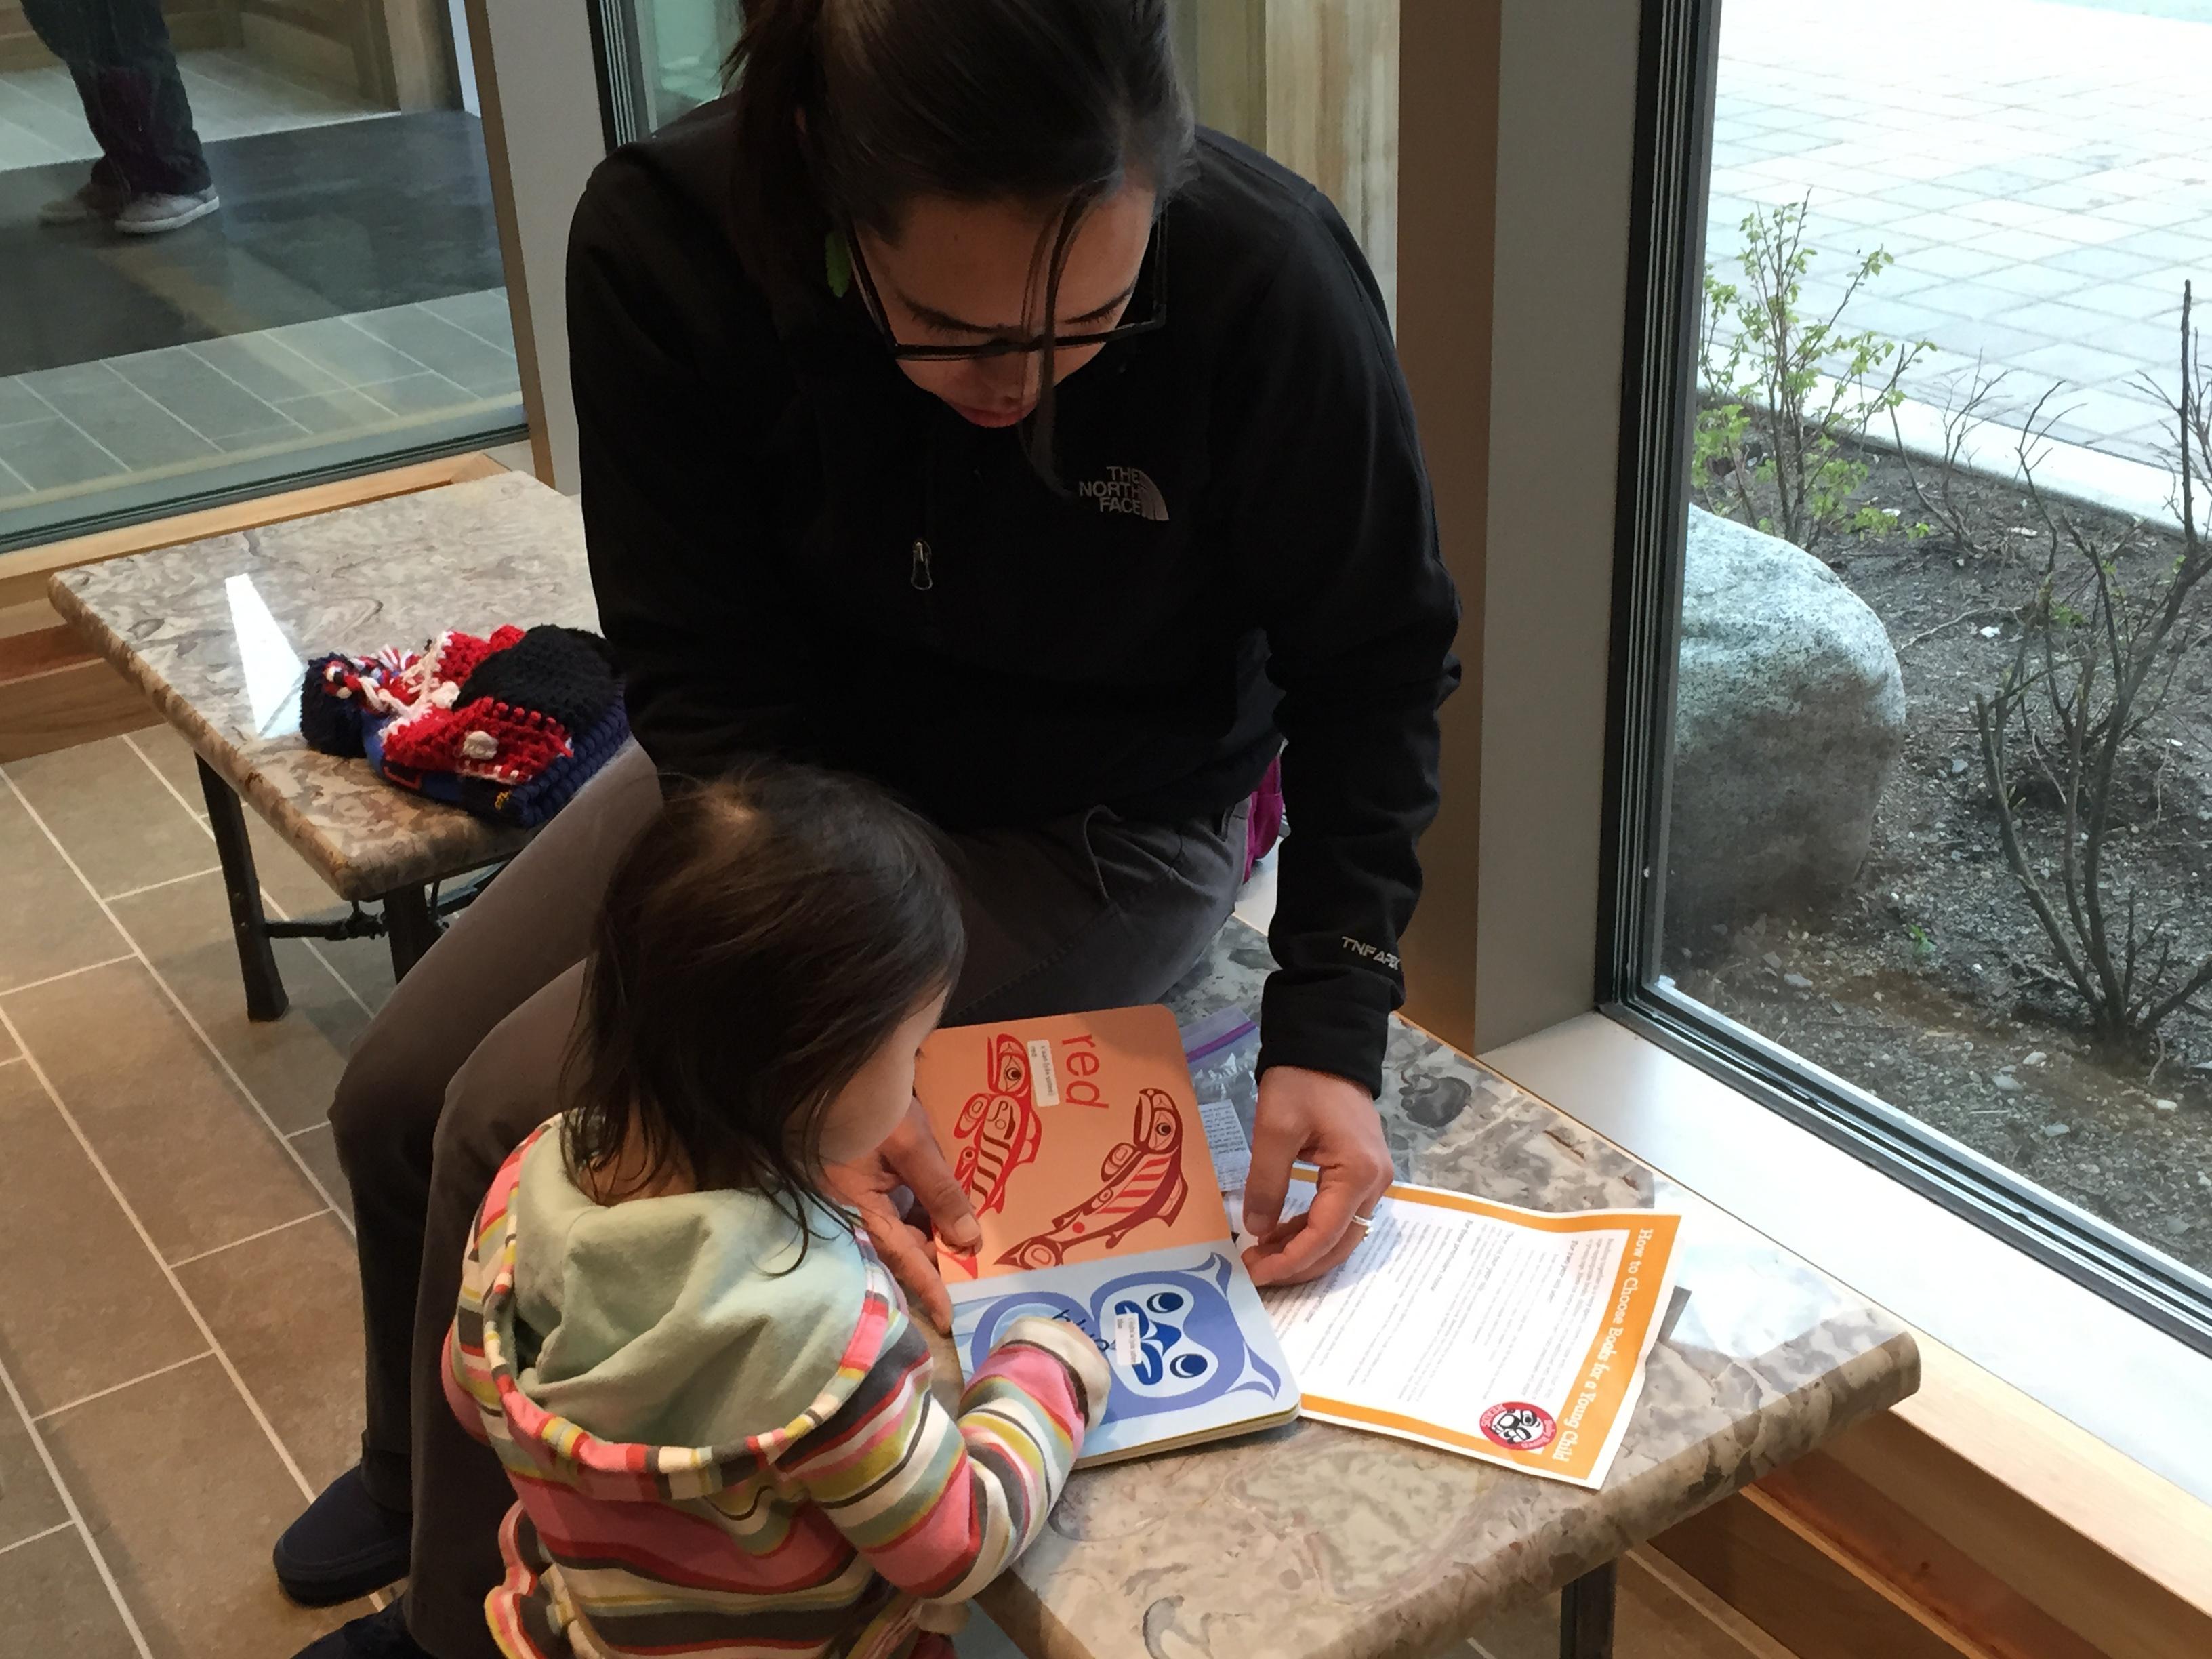 Margaret Katzeek brought her niece Elayna Katzeek to the Baby Raven Reads family night. (Photo by Lisa Phu/KTOO)